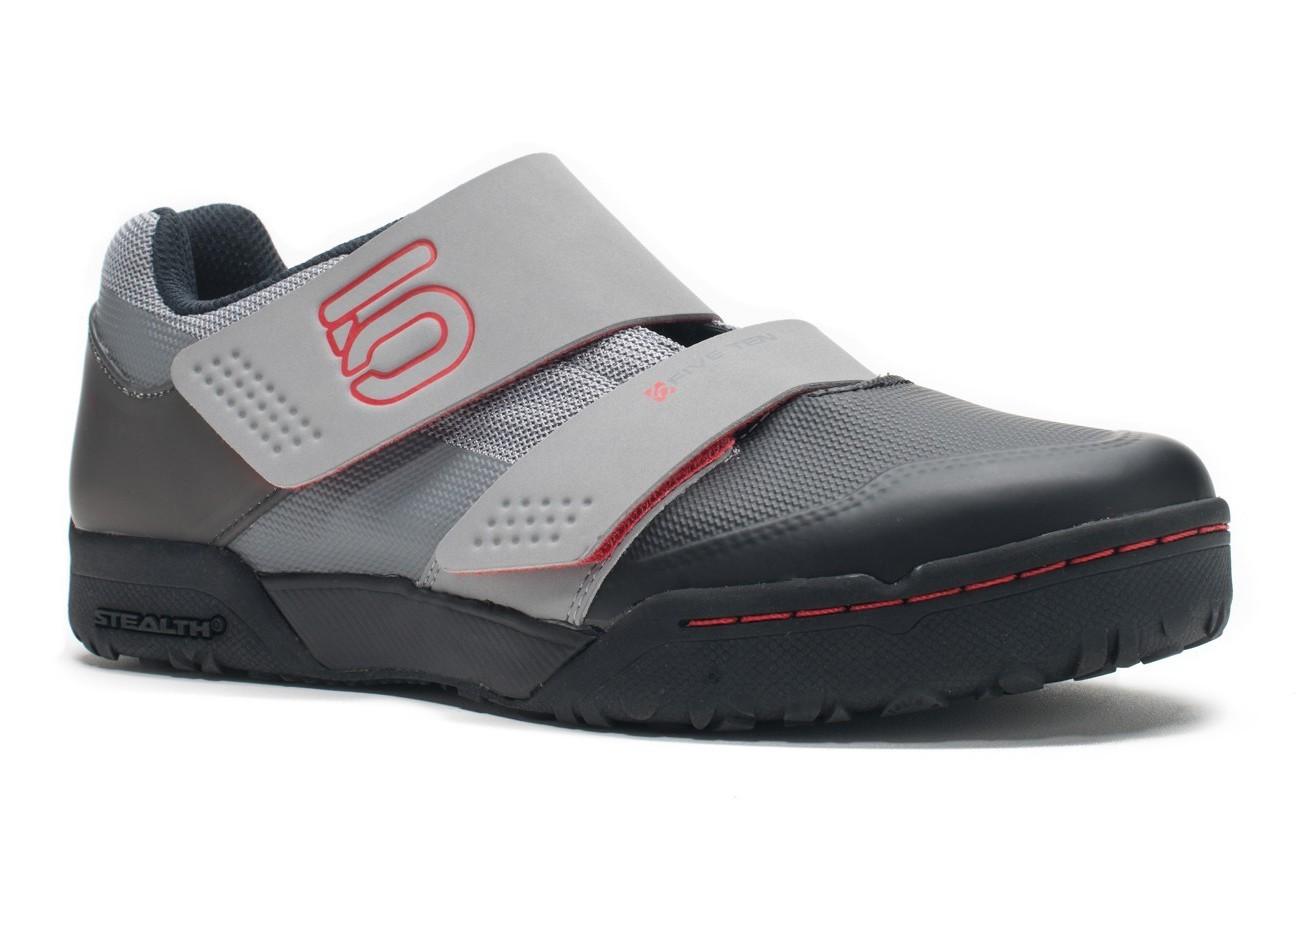 Five Ten Maltese Falcon Race Men's Clipless MTB Shoe - Mono Grey/Red